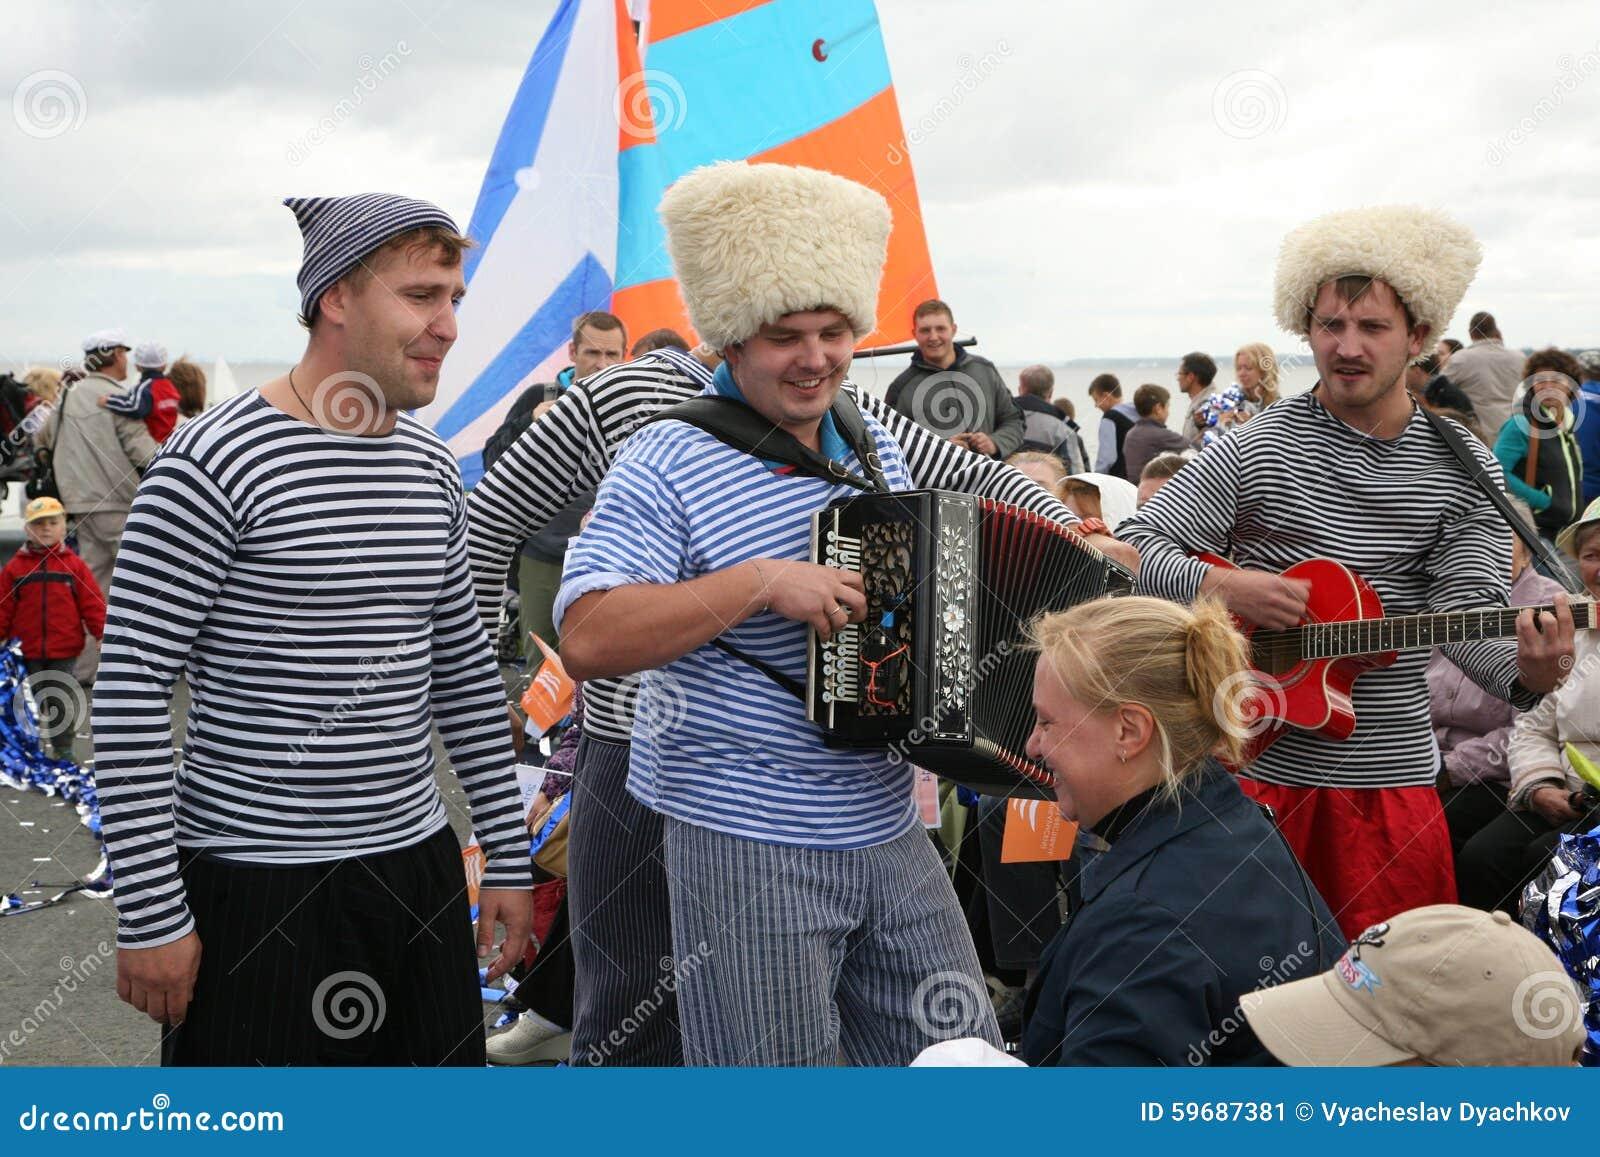 The Performance Of Russian Music Pop Folk Group Ensemble